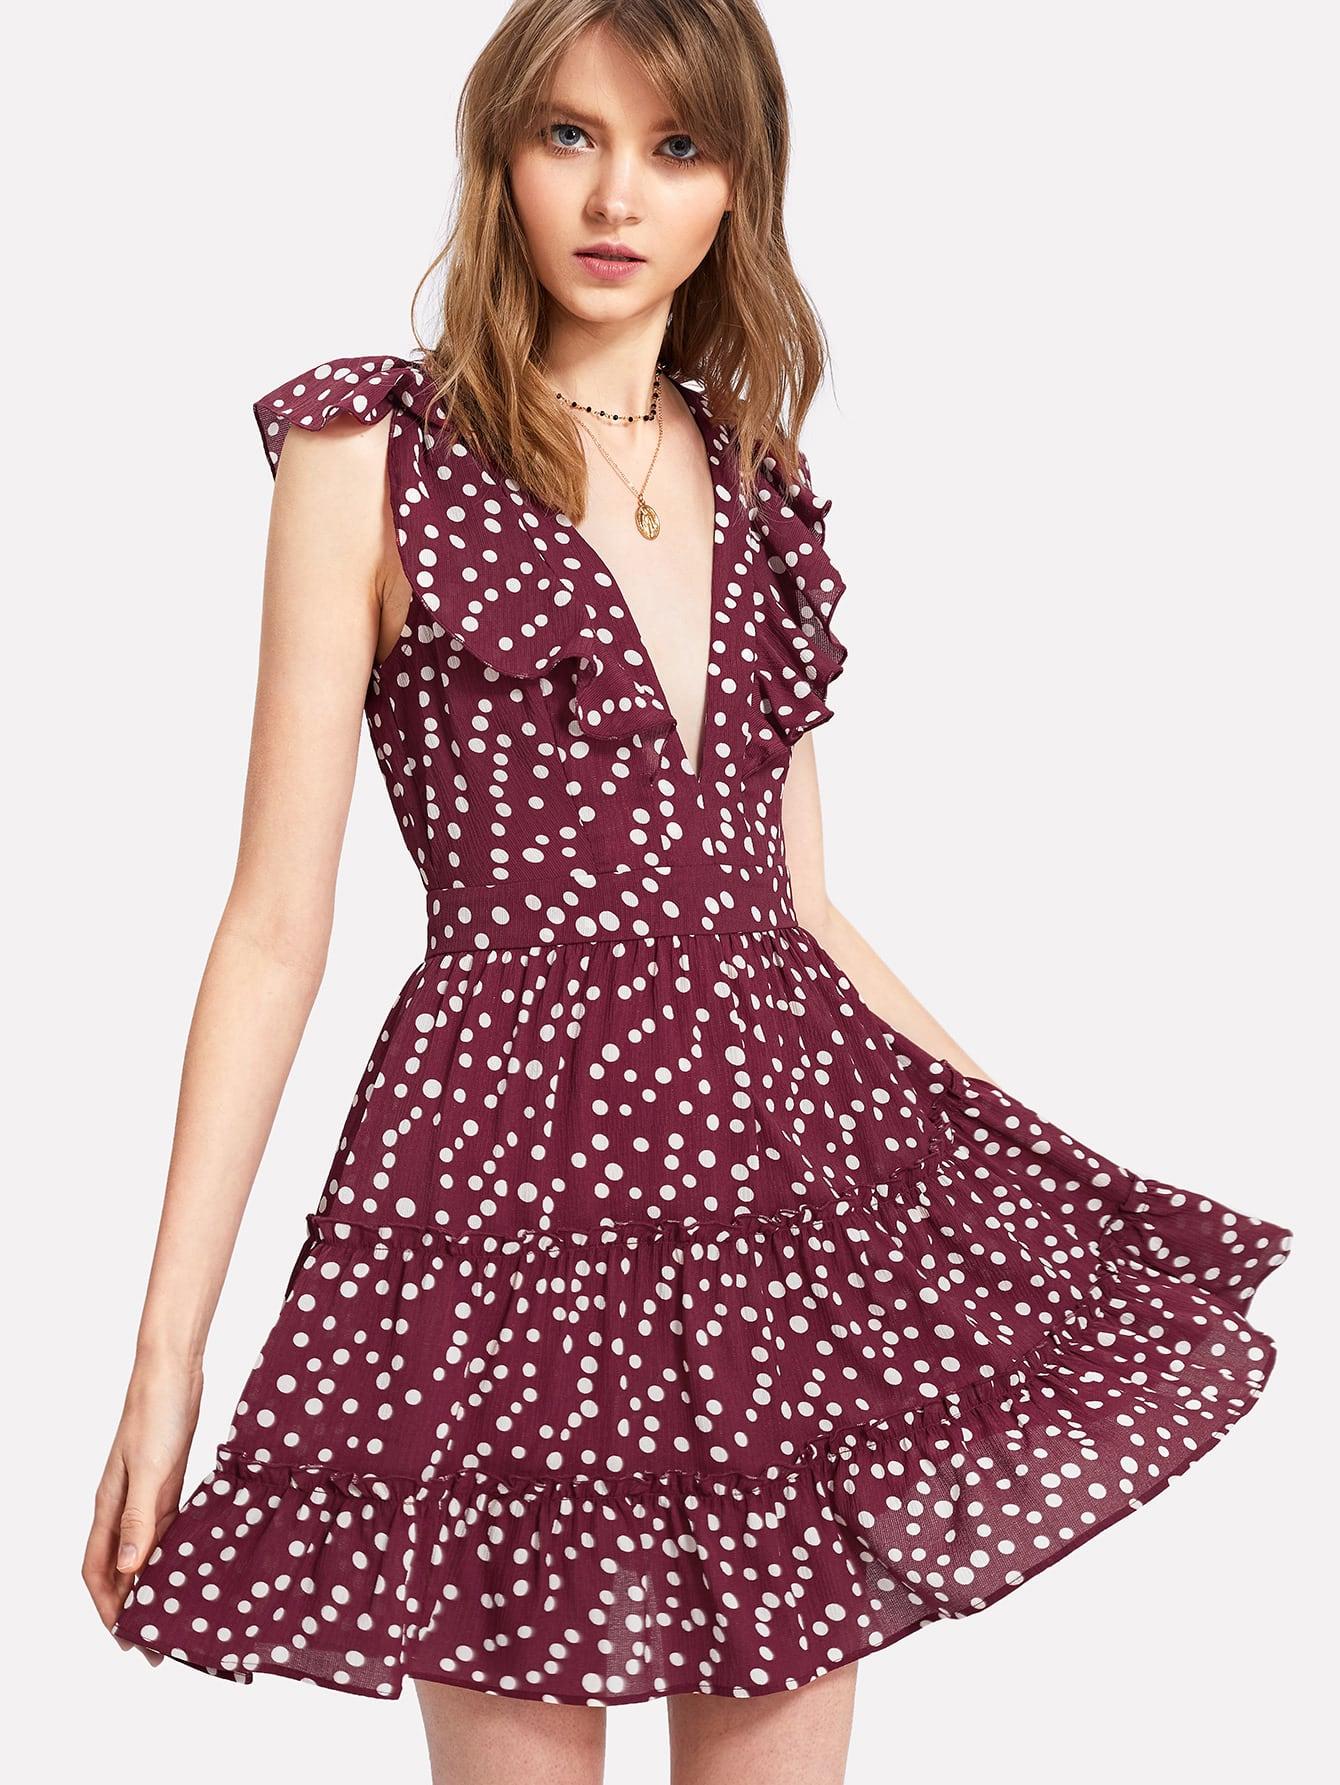 Ruffle Trim Tiered Plunging Polka Dot Dress ruffle trim belted polka dot dress